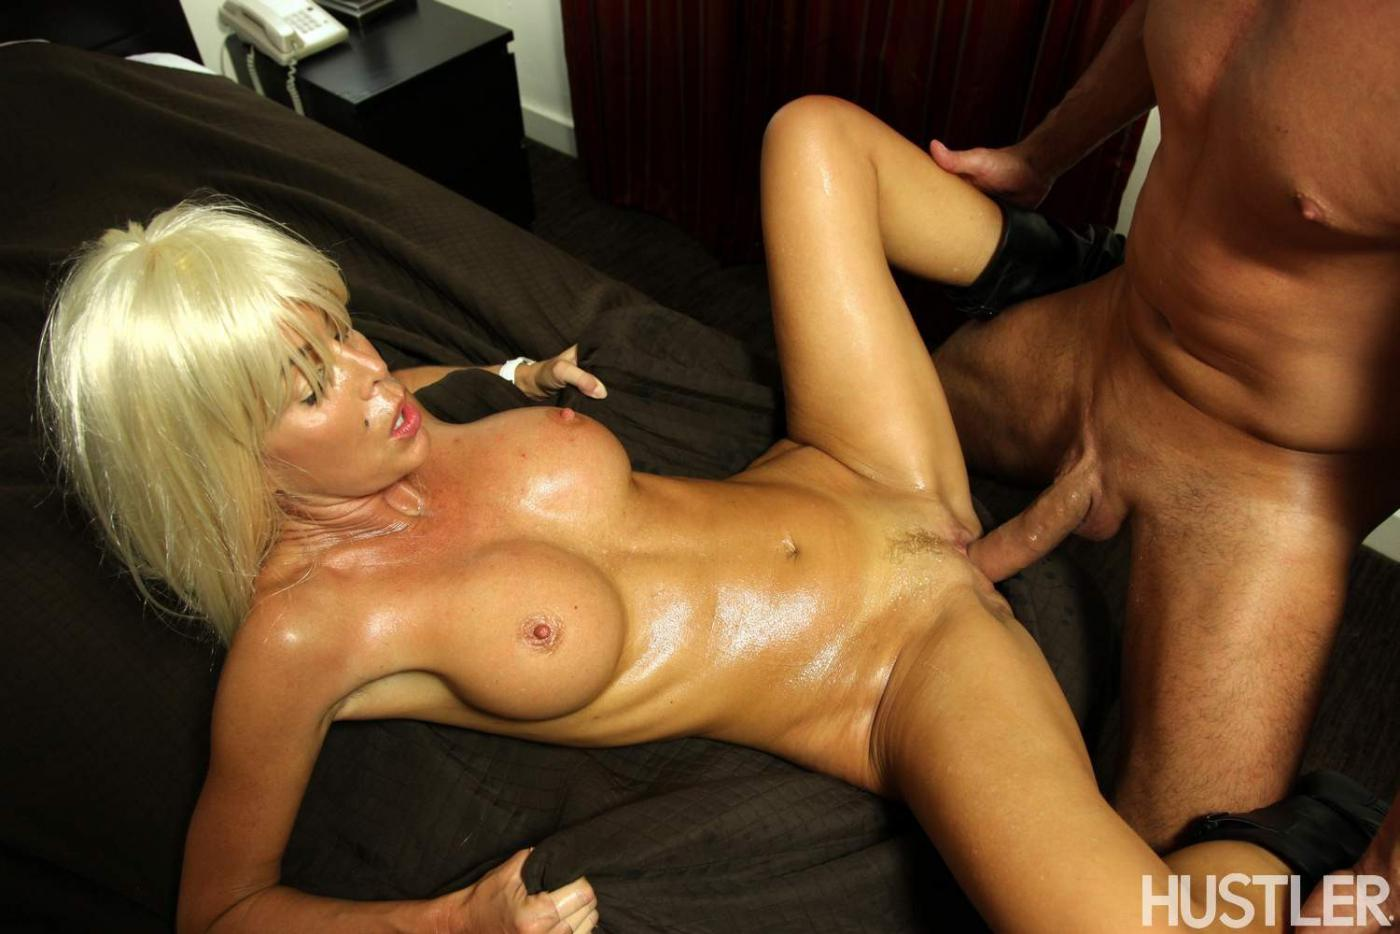 Pics of tabitha stevens nude #11